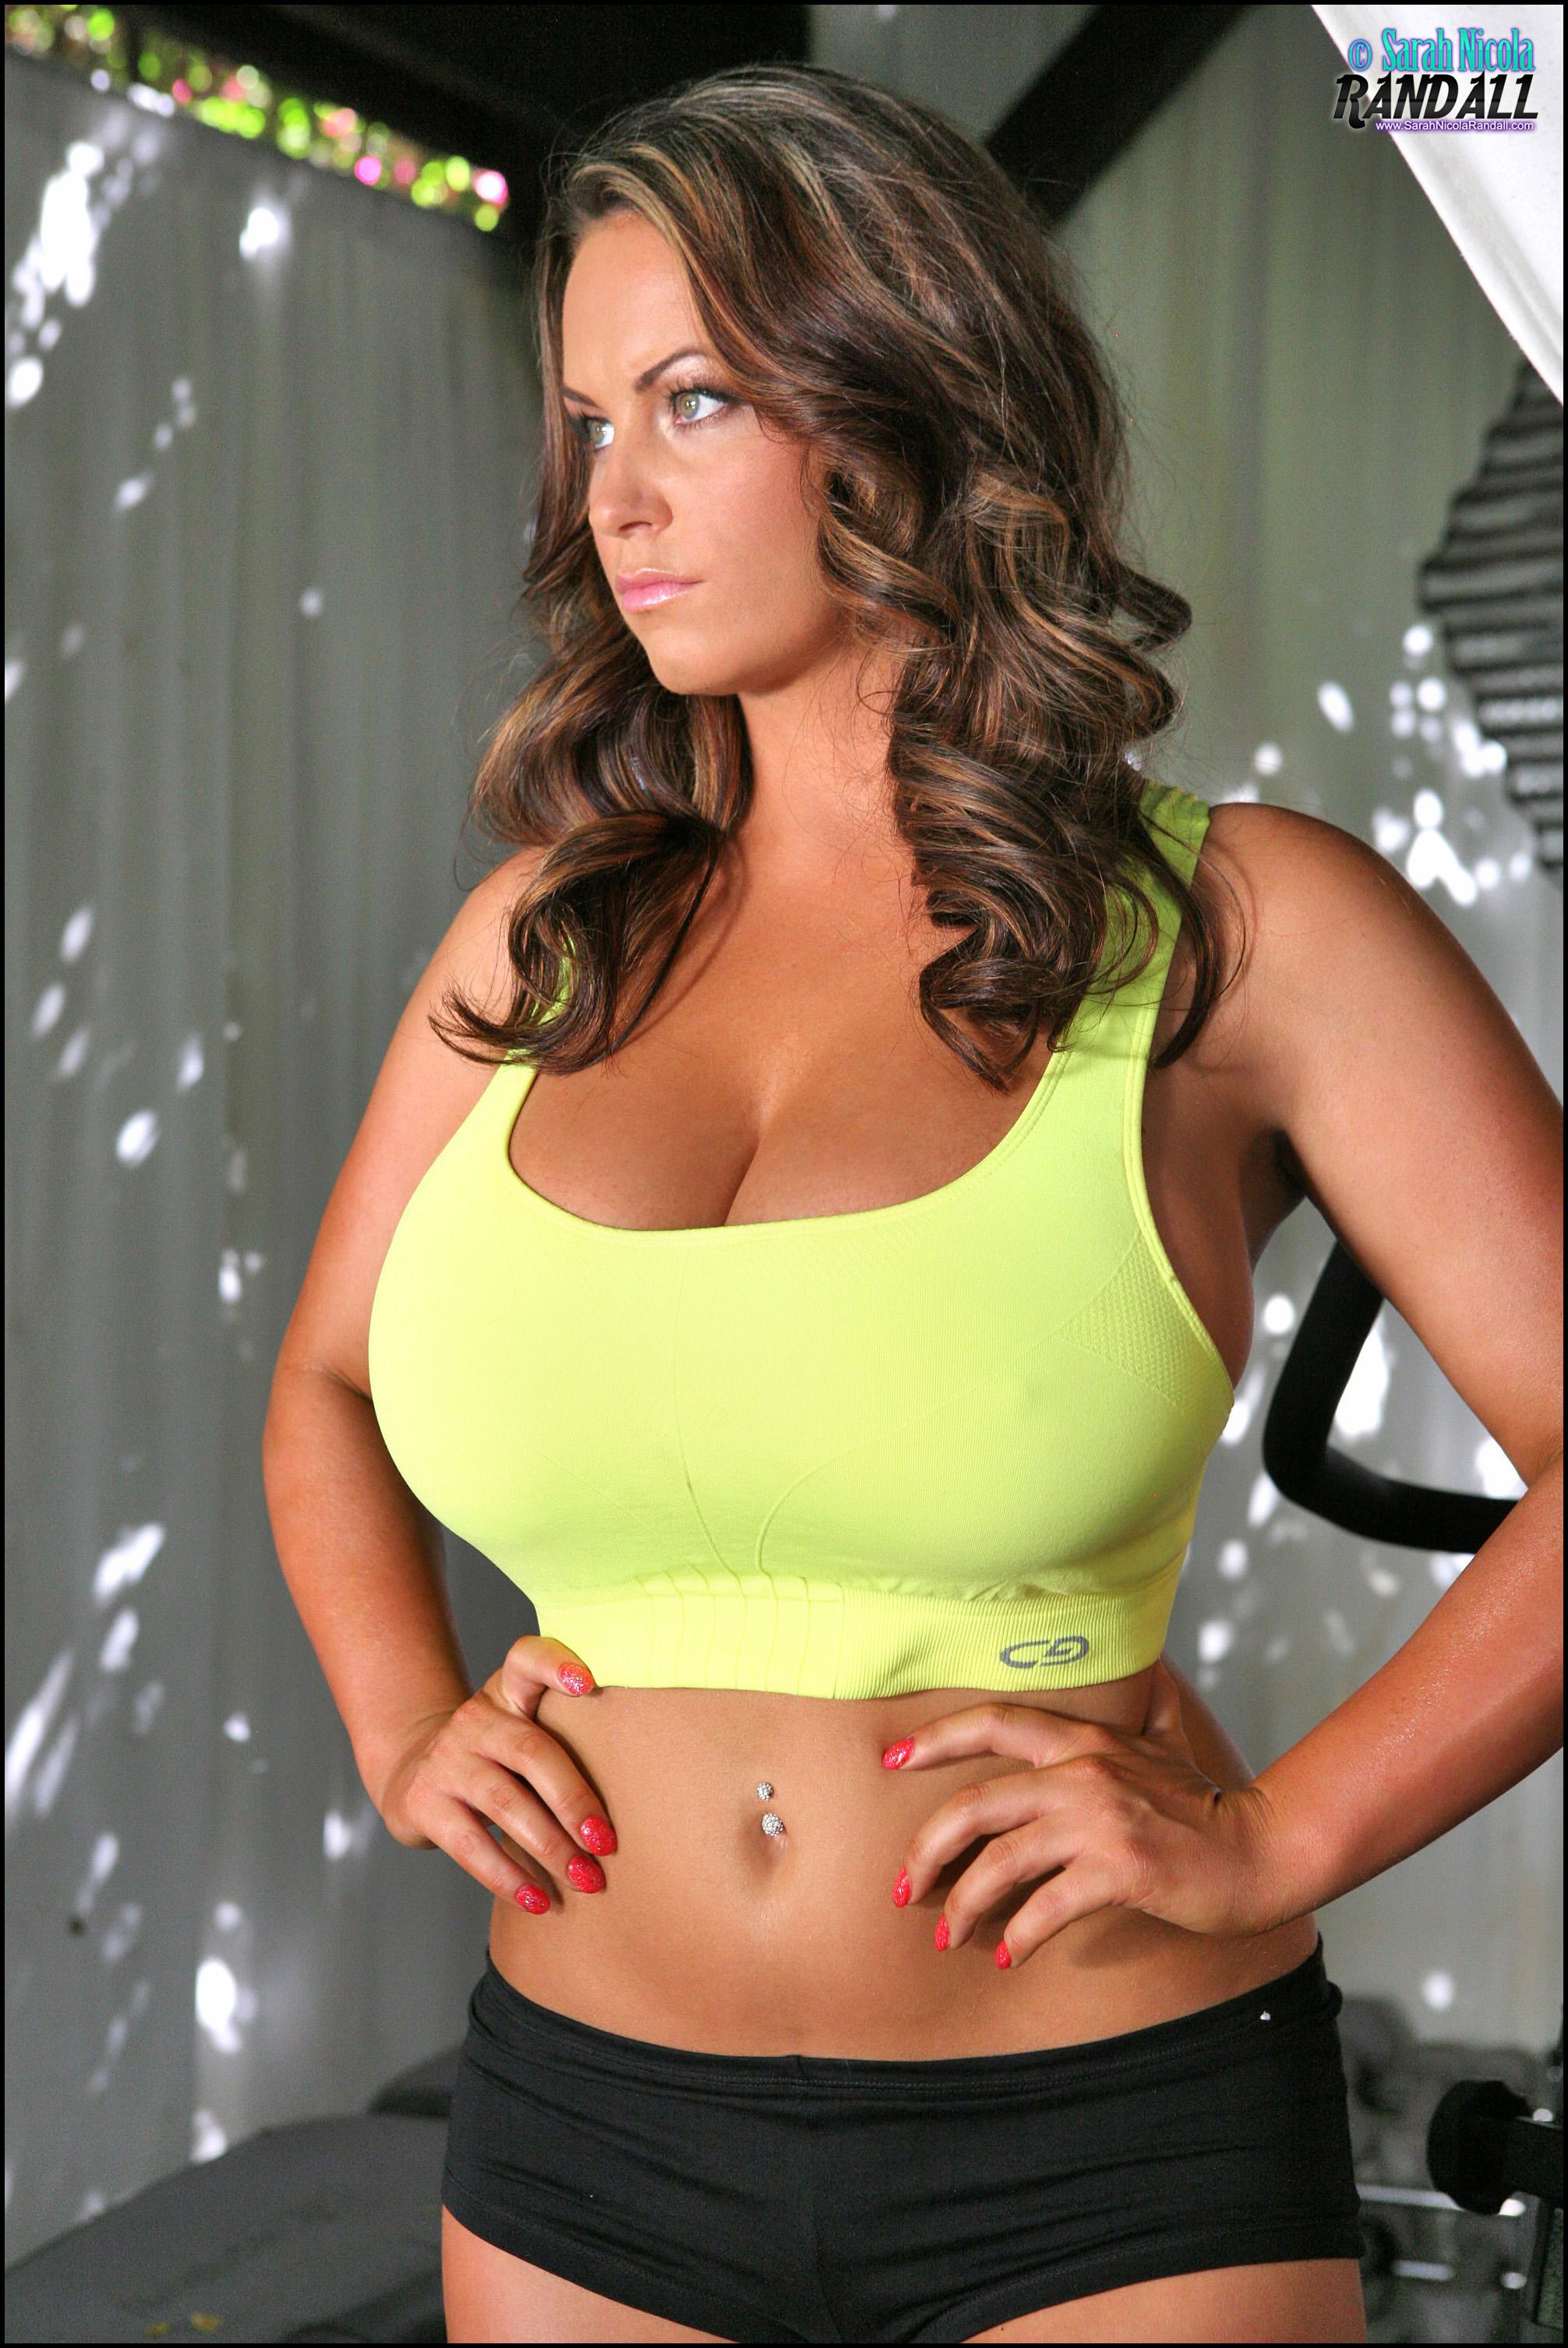 Sarah Nicola Randall Huge Boobs Glistening in Tight Yellow ...